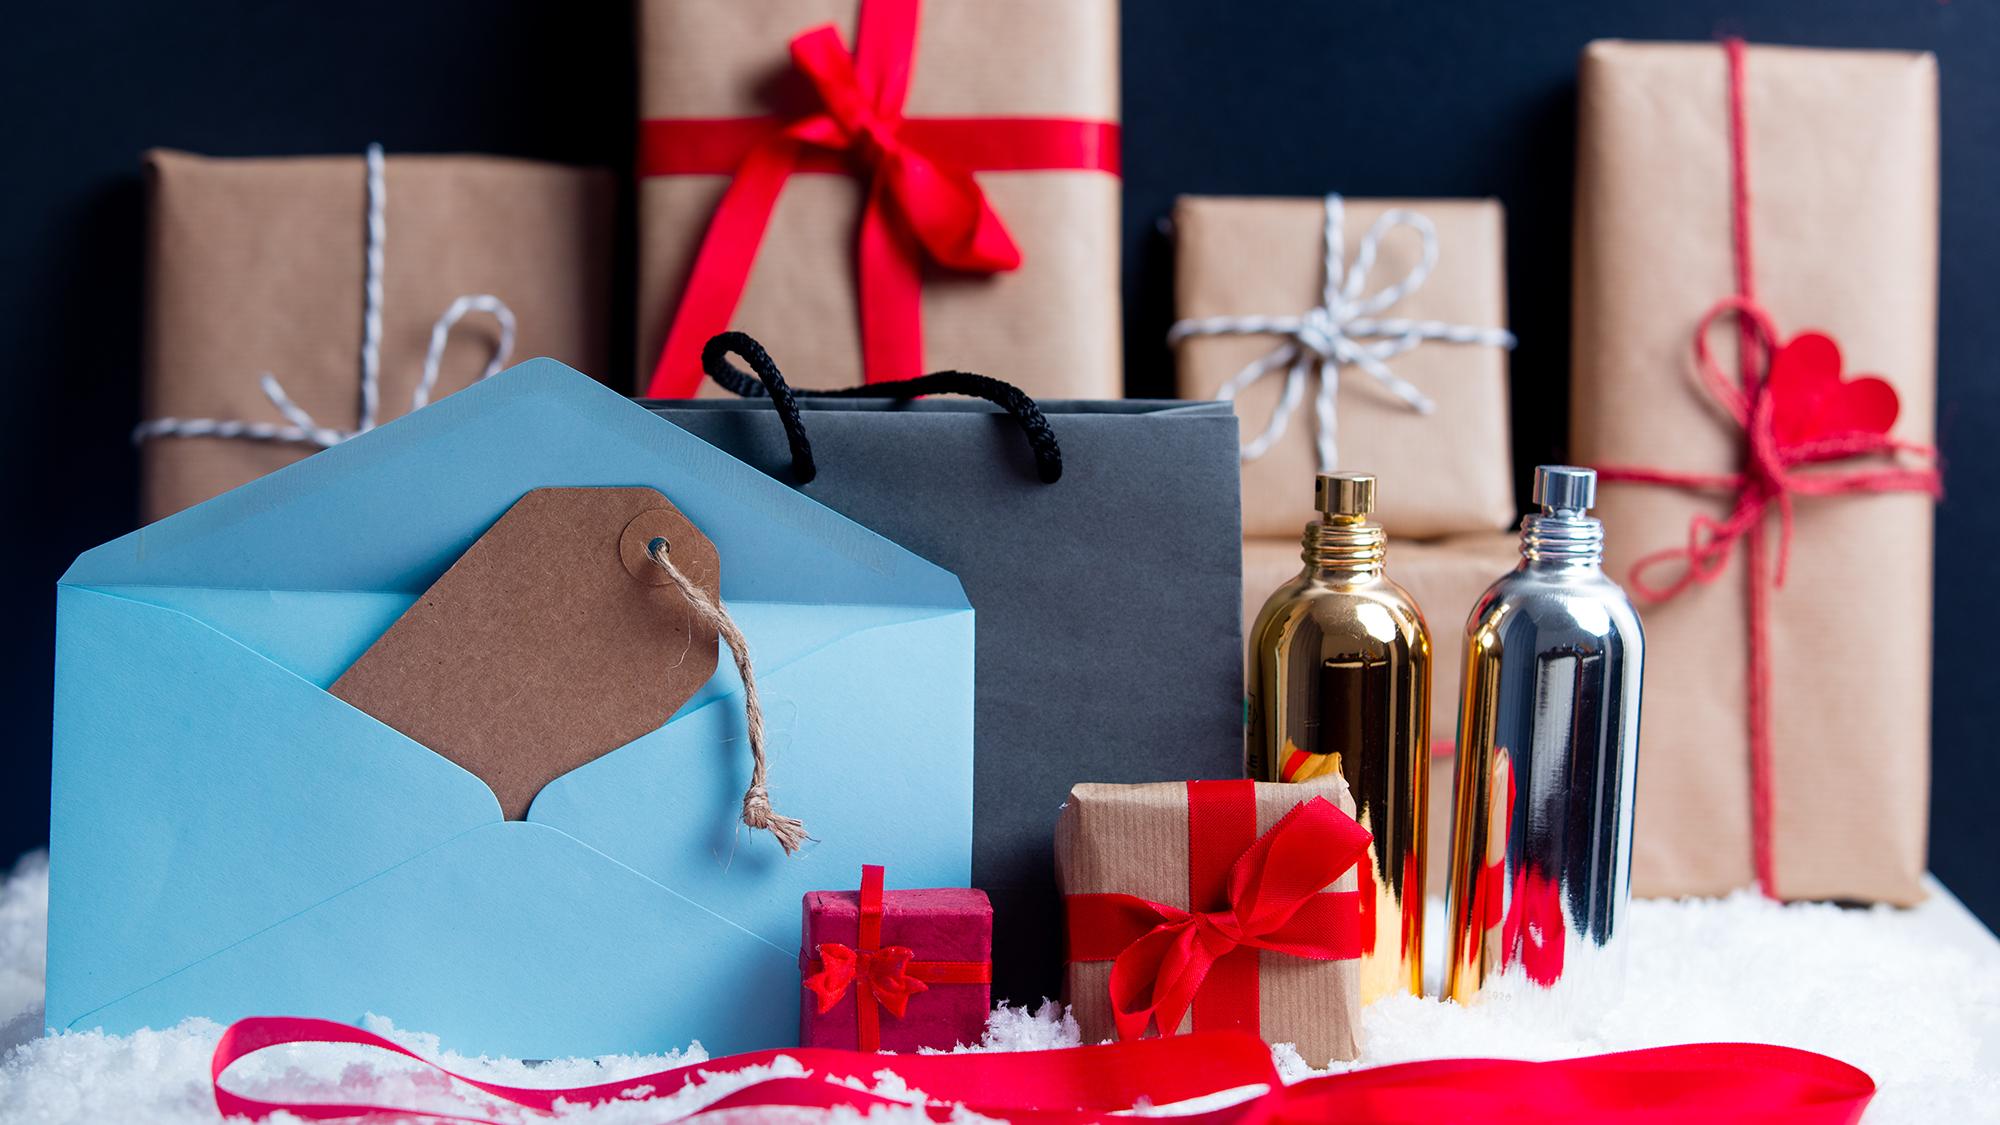 fragrance perfume gift set present